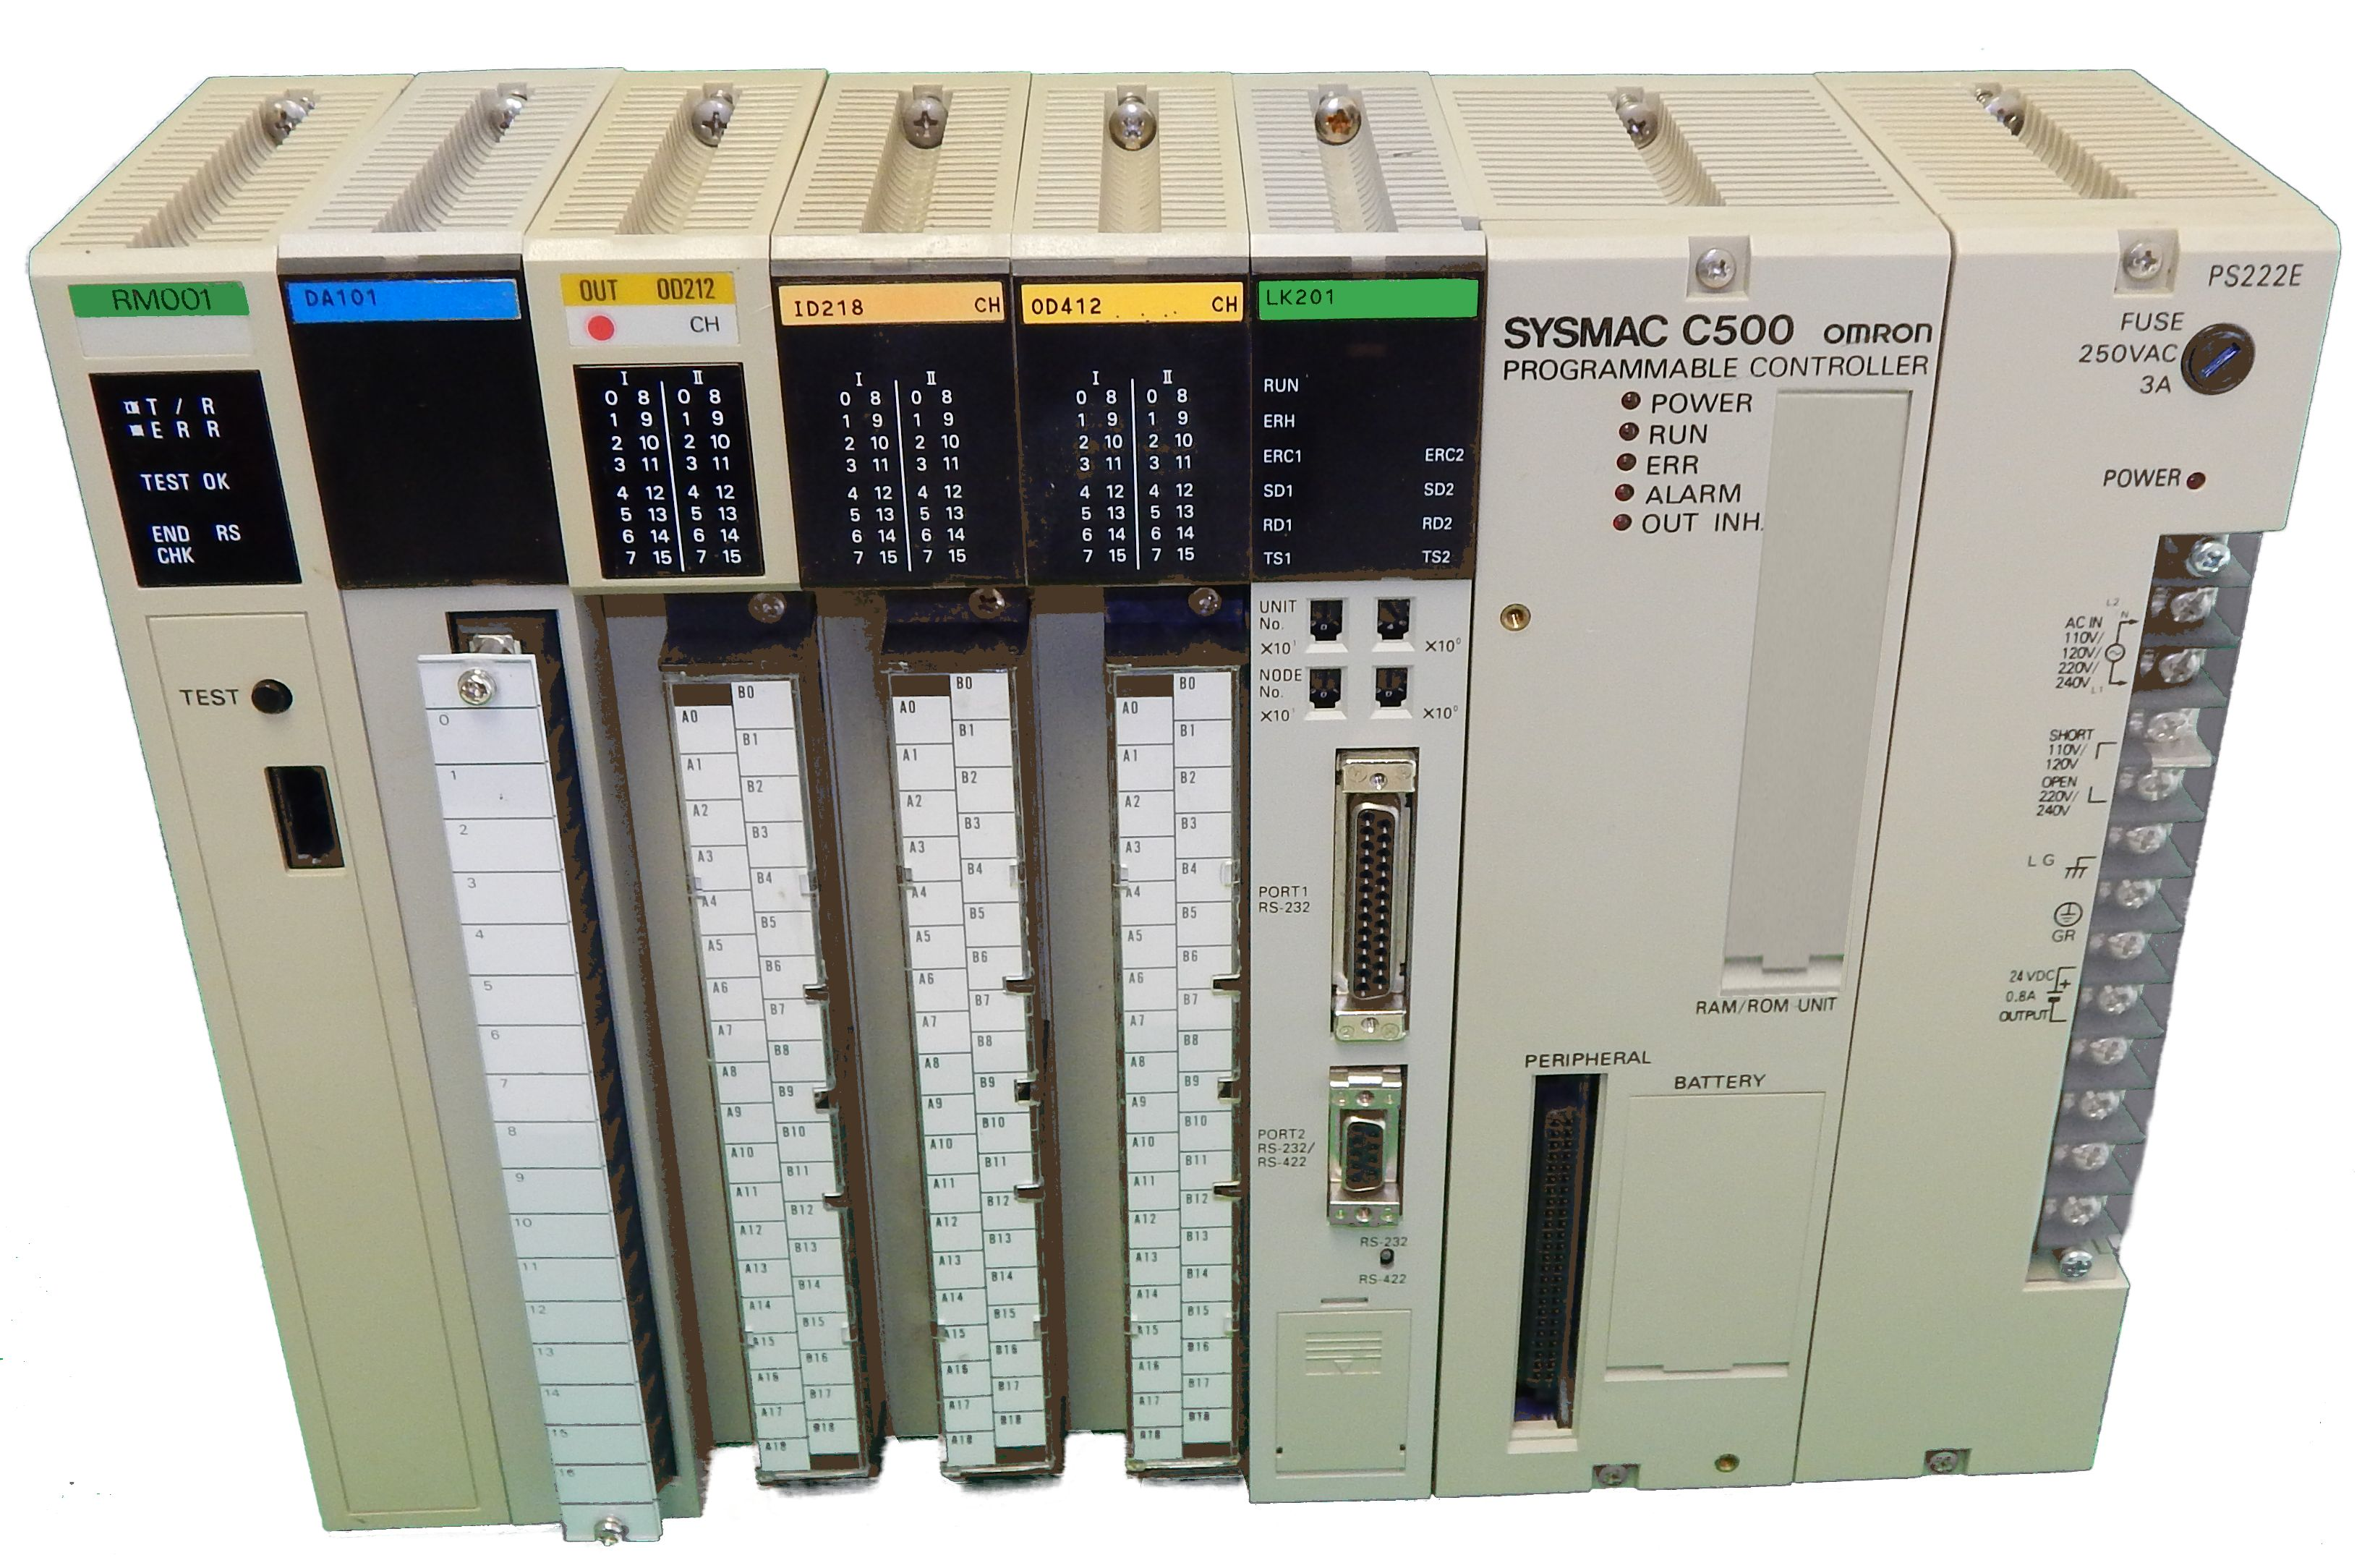 3G2C5-CPU01